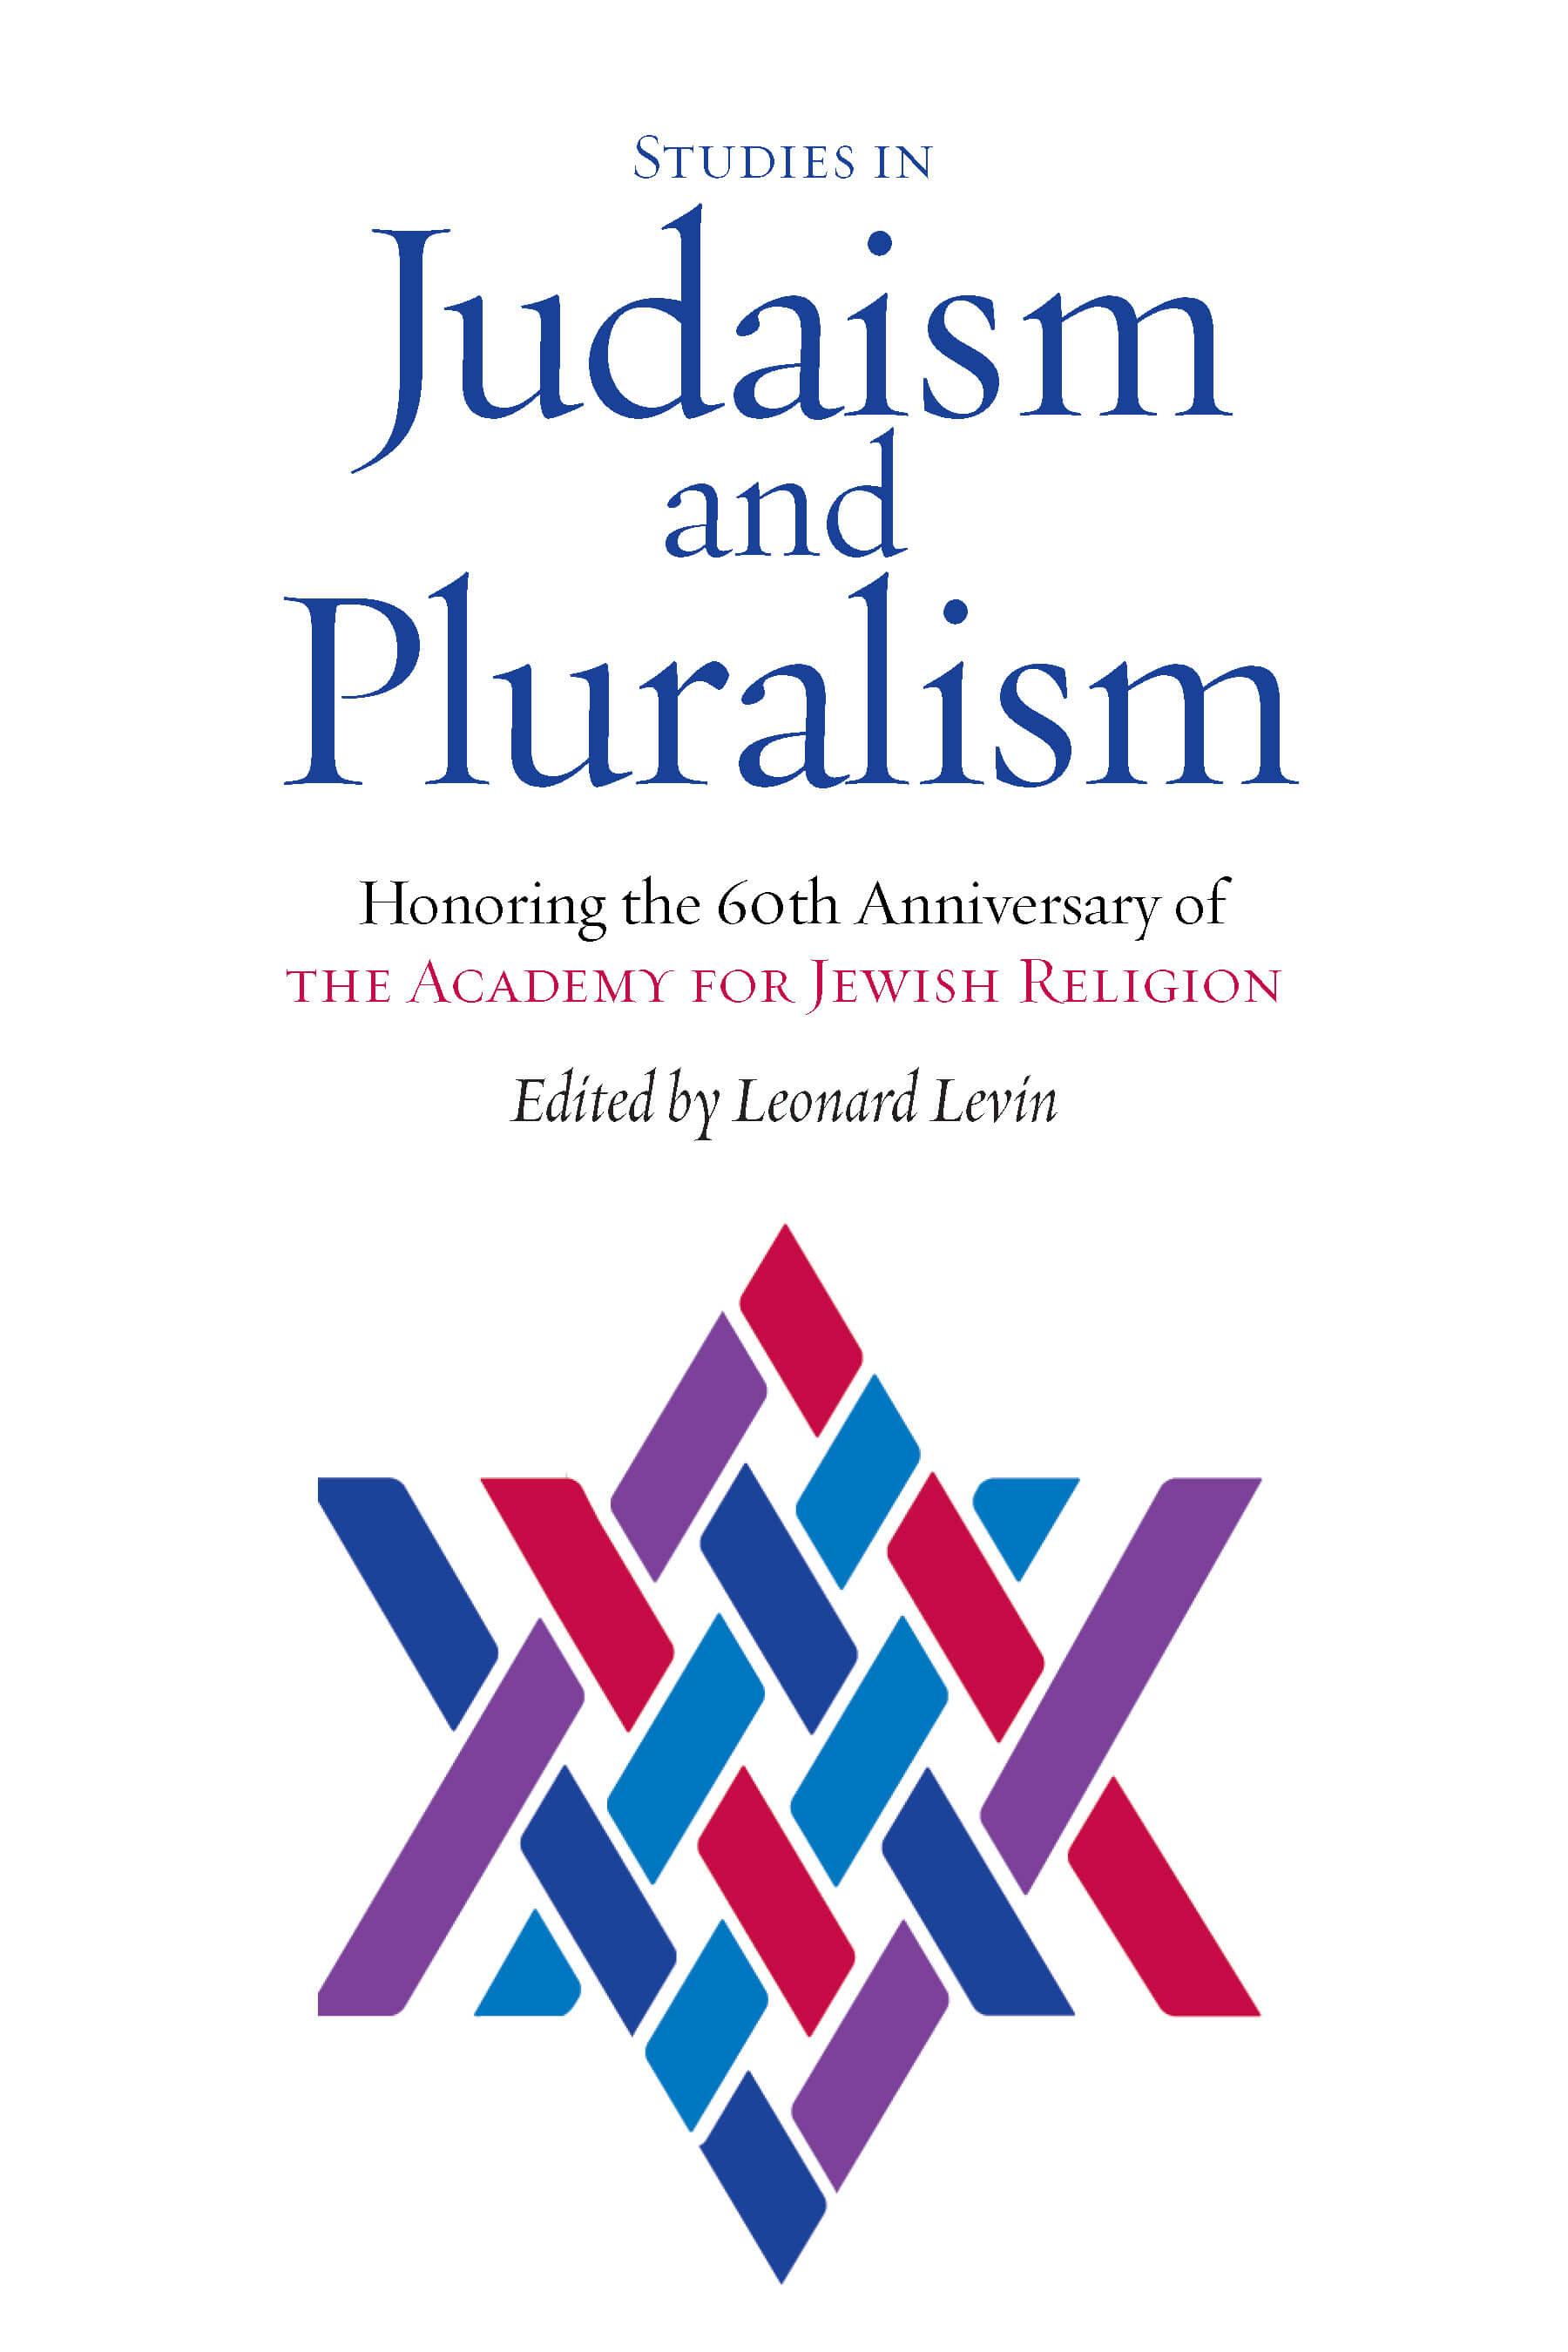 studies in judaism and pluralism - ben yehuda press